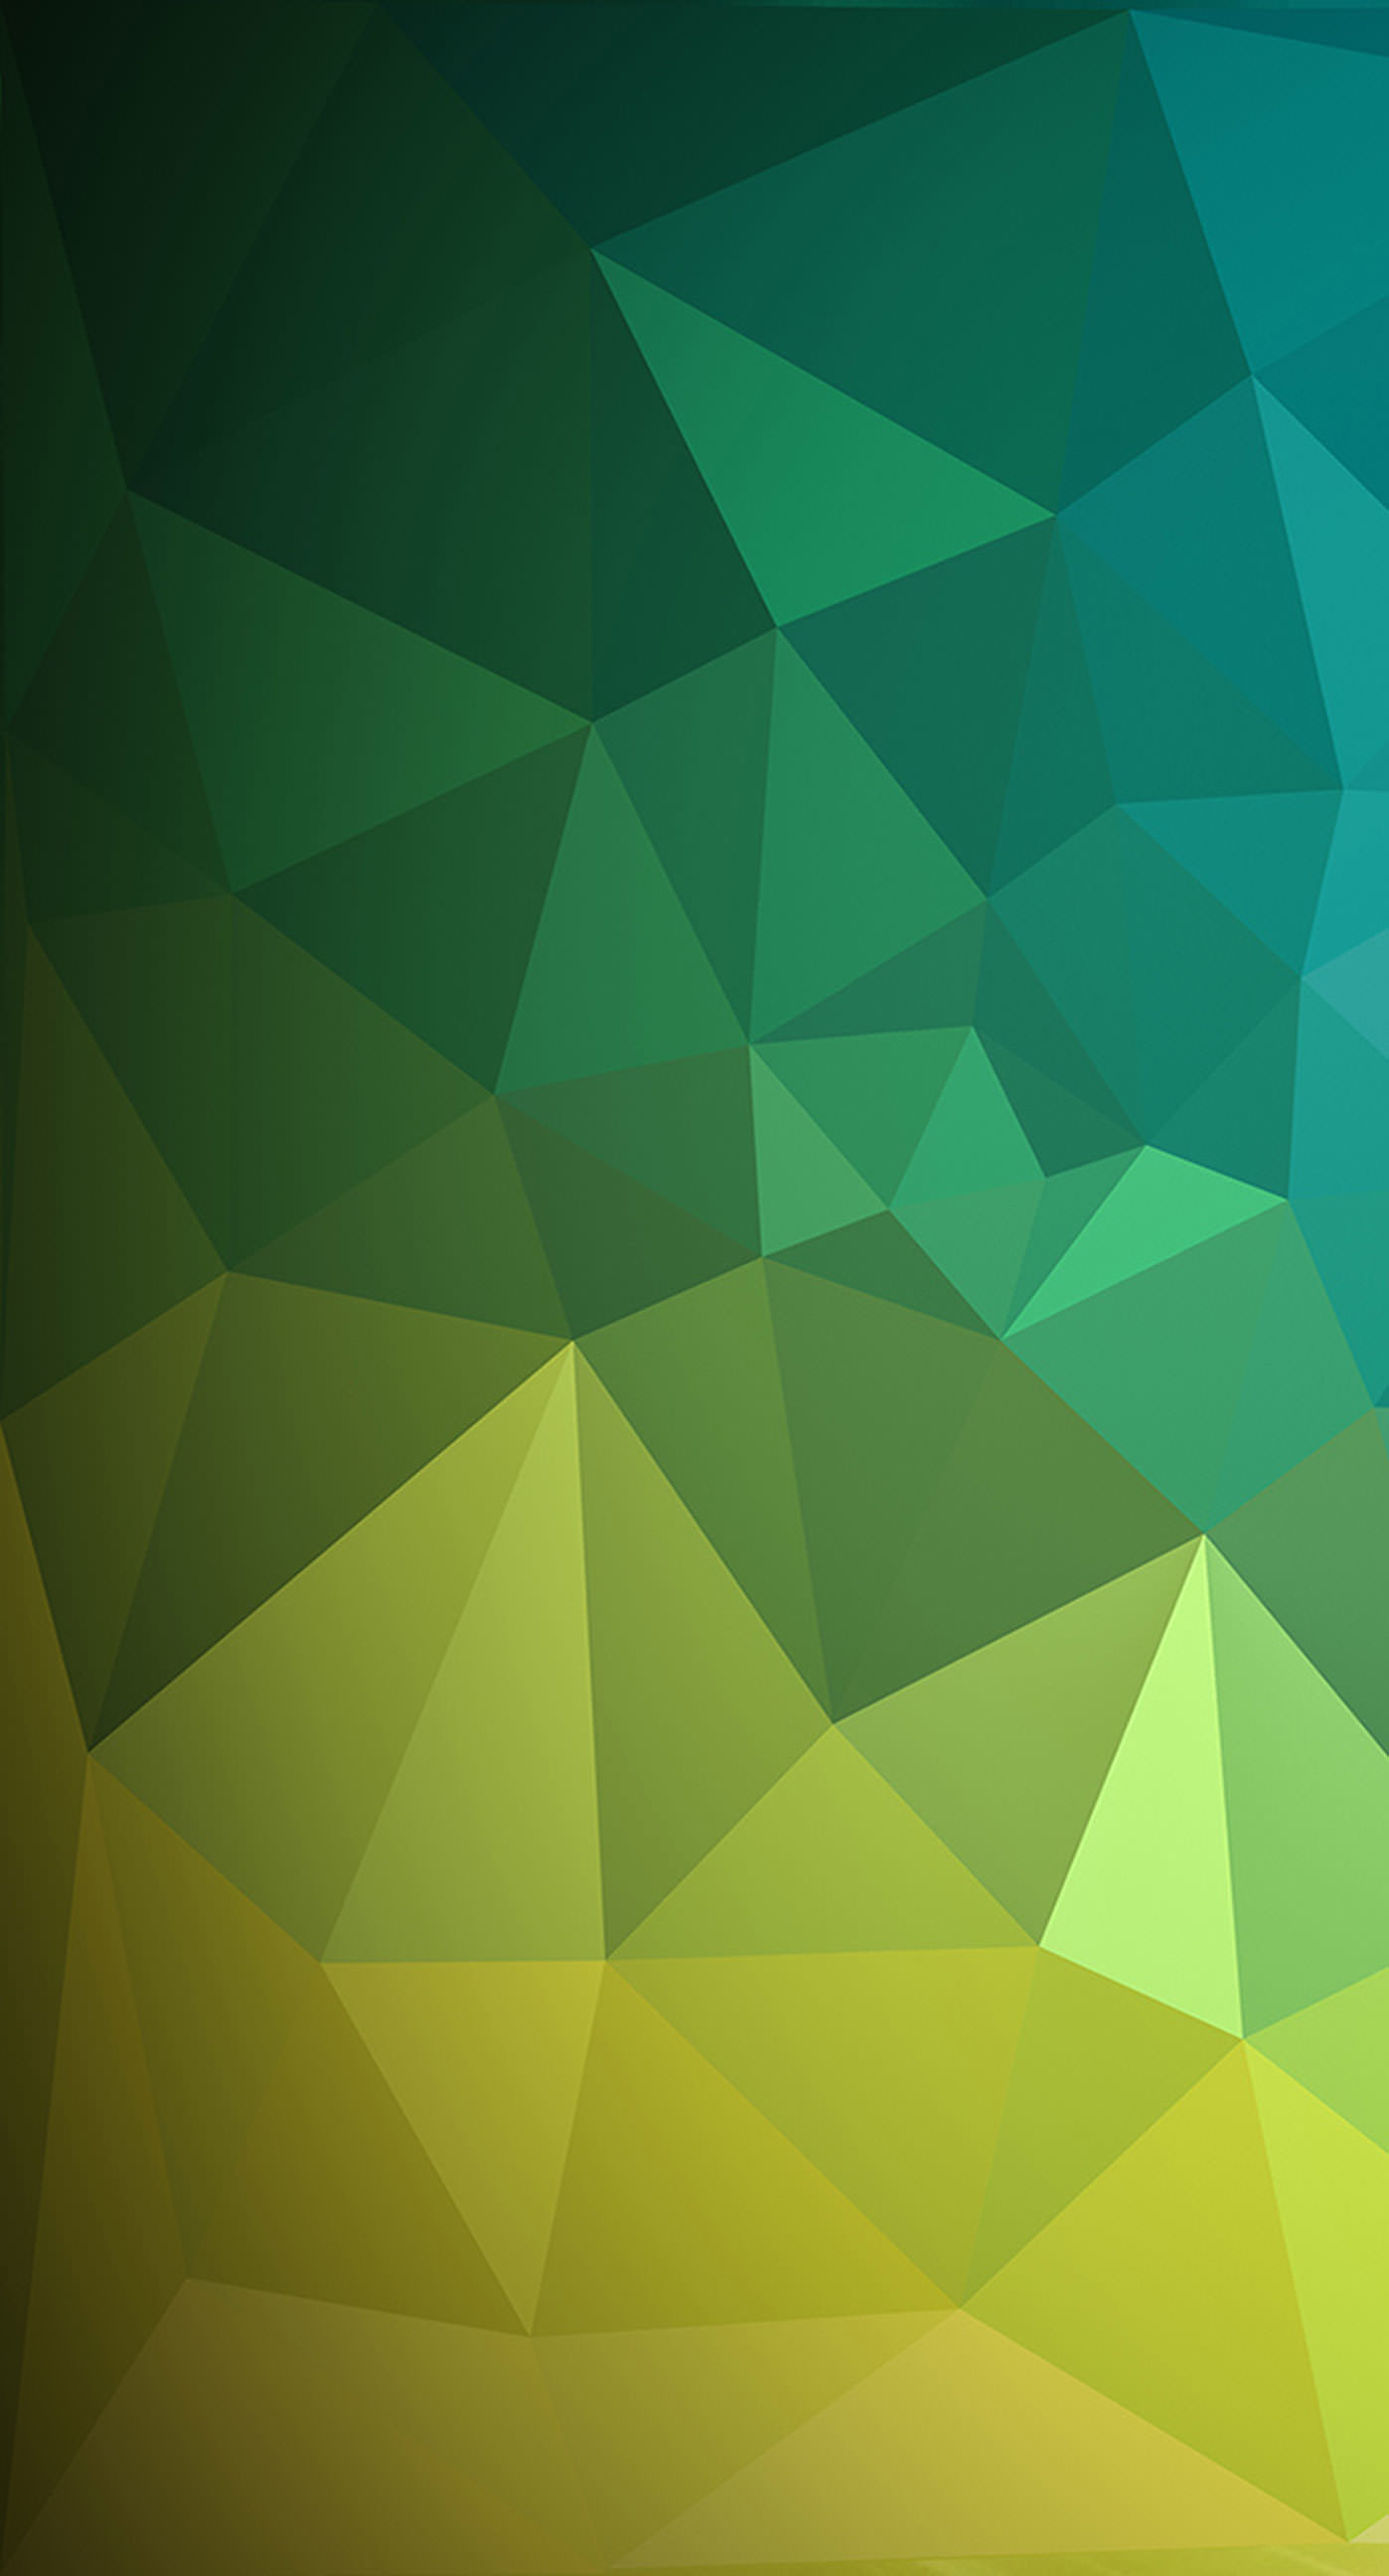 1398x2592, Iphone 7 Plus Wallpaper   Data Id 66731 - Cool Green Wallpaper For Iphone - HD Wallpaper